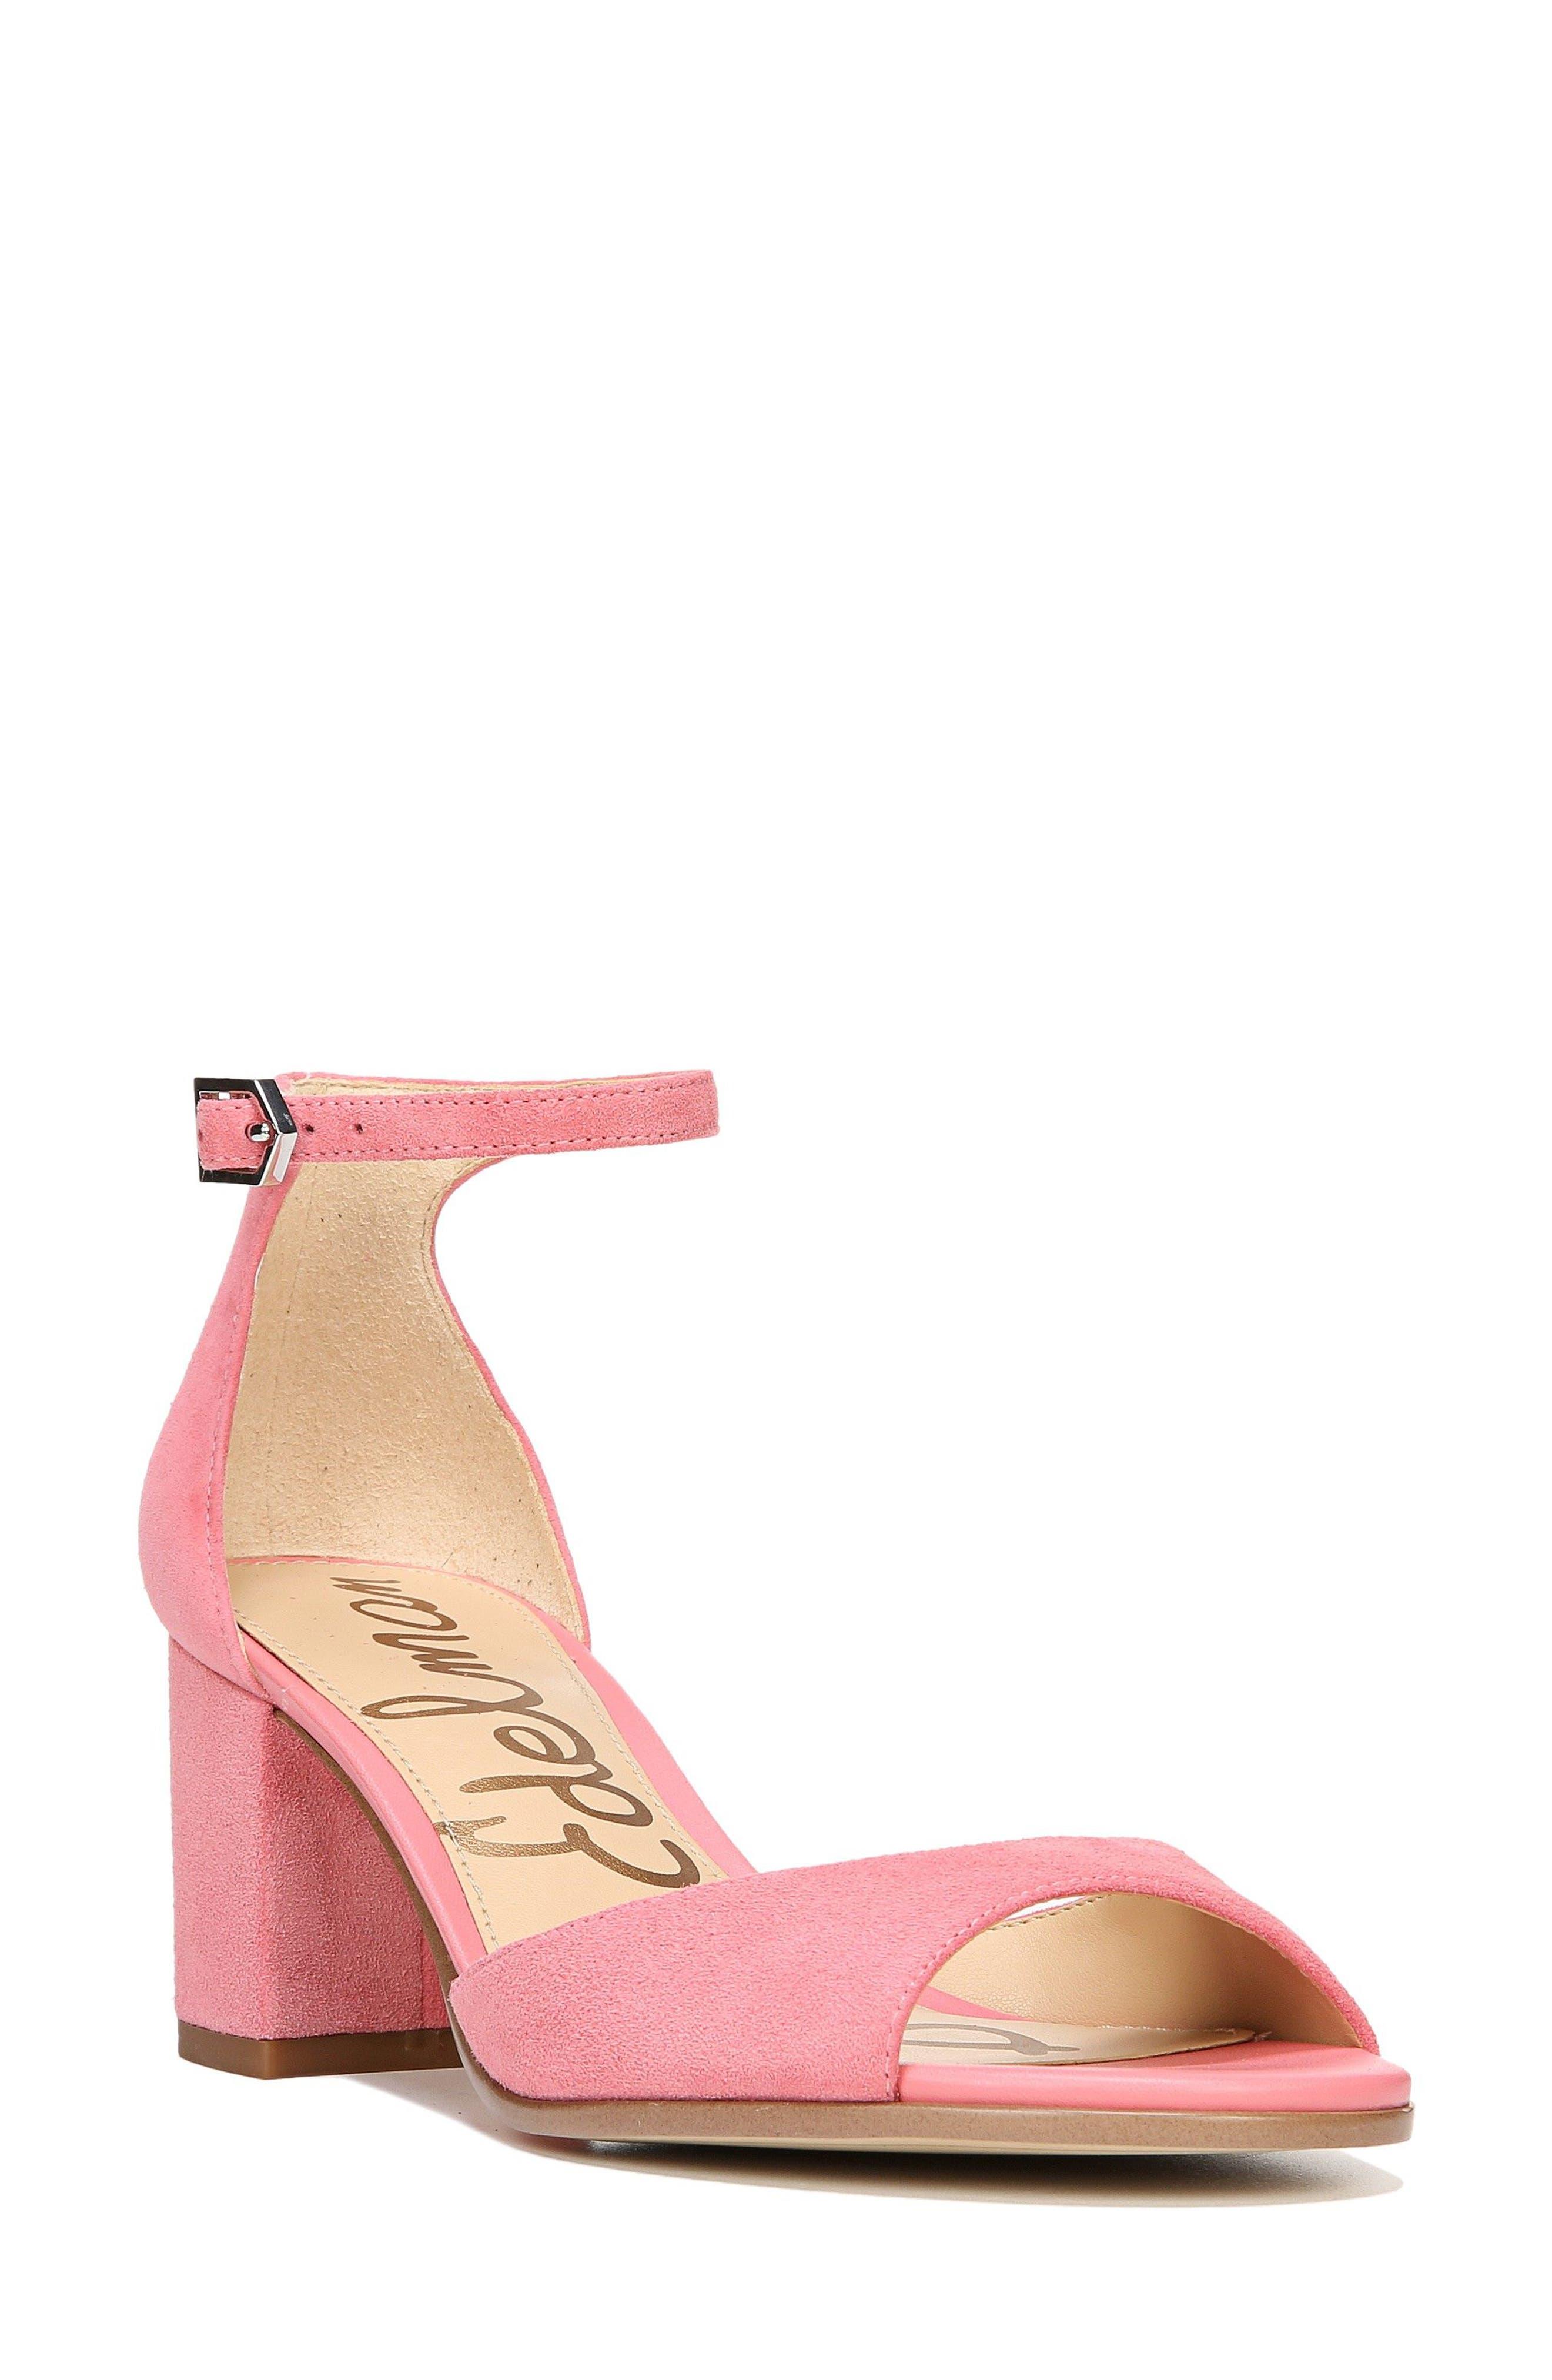 Sam Edelman Susie d'Orsay Ankle Strap Sandal (Women)